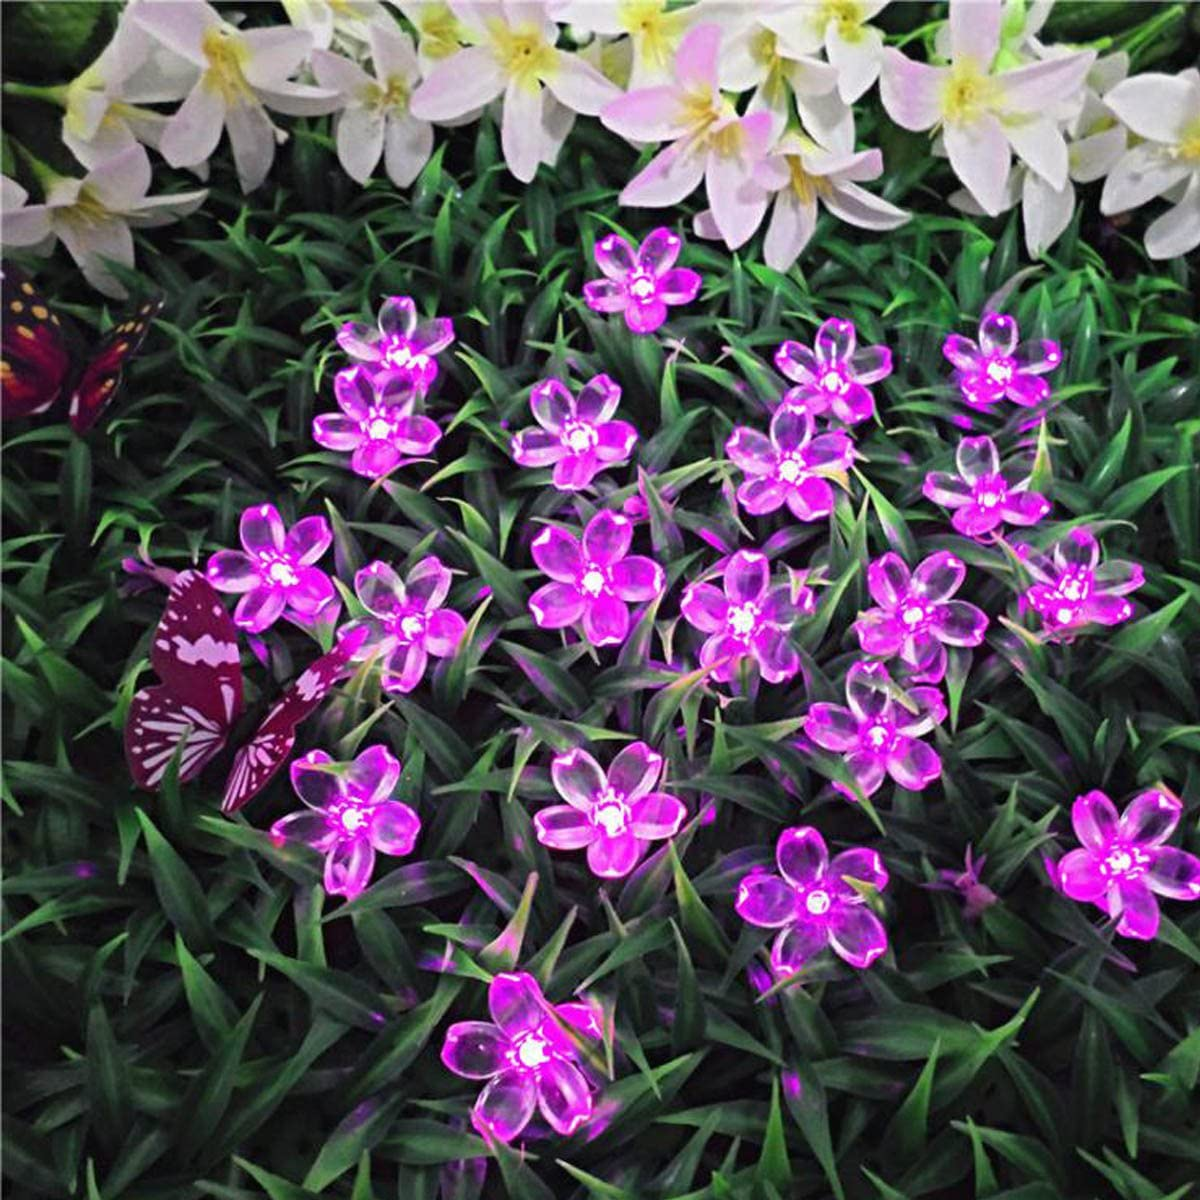 50 LED Solar Flower Fairy String Light Blossom Waterproof Outdoor Party Decor